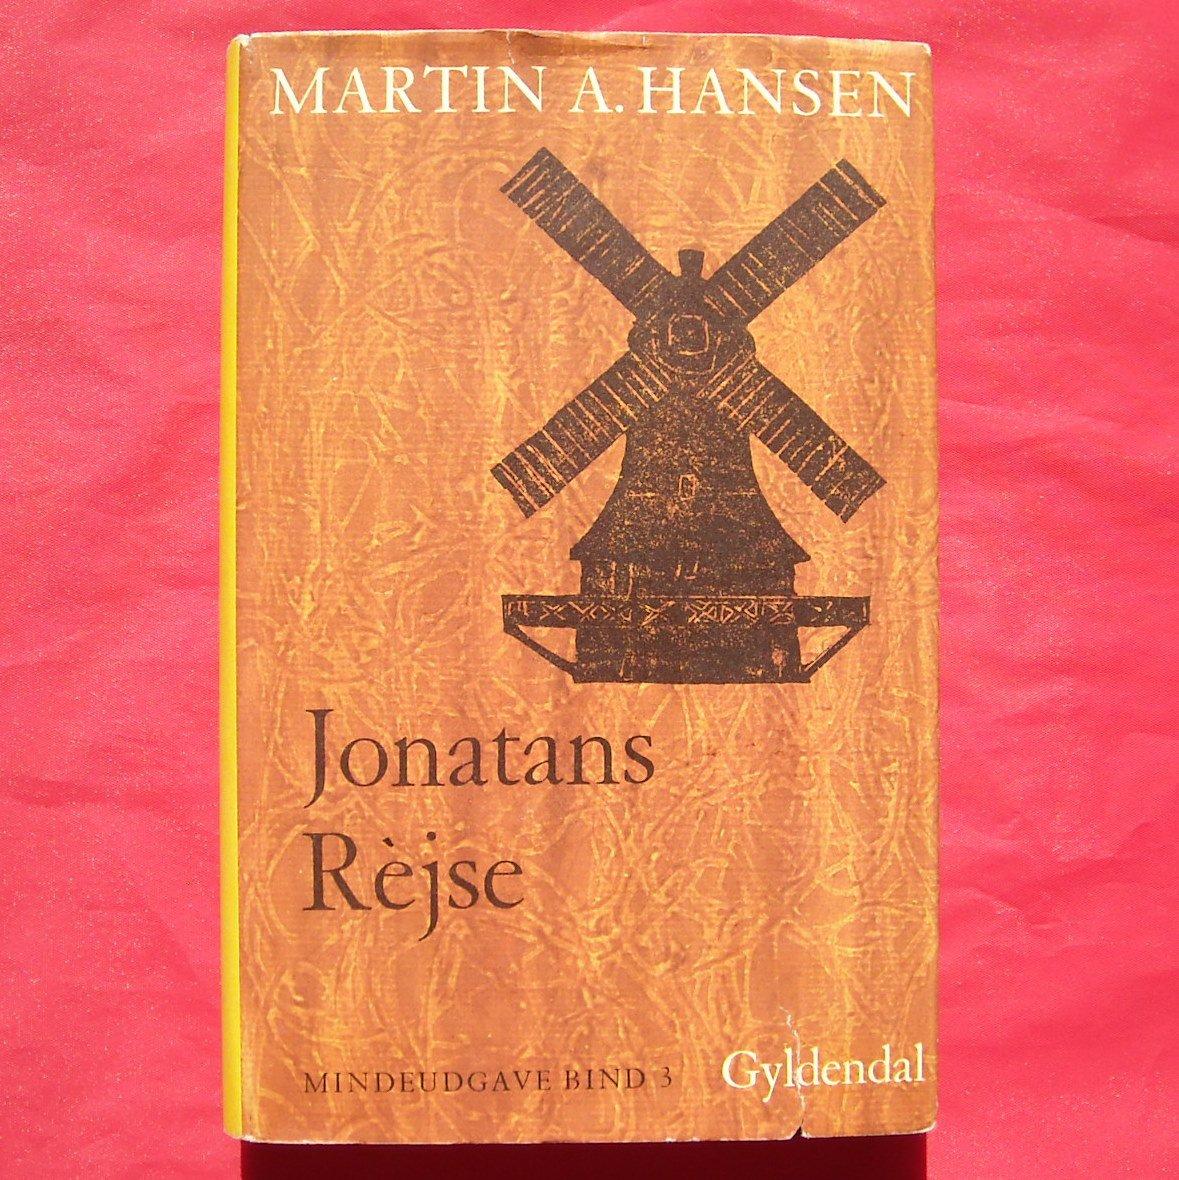 Martin A Hansen Mindeudgave In DANISH JONATANS REJSE